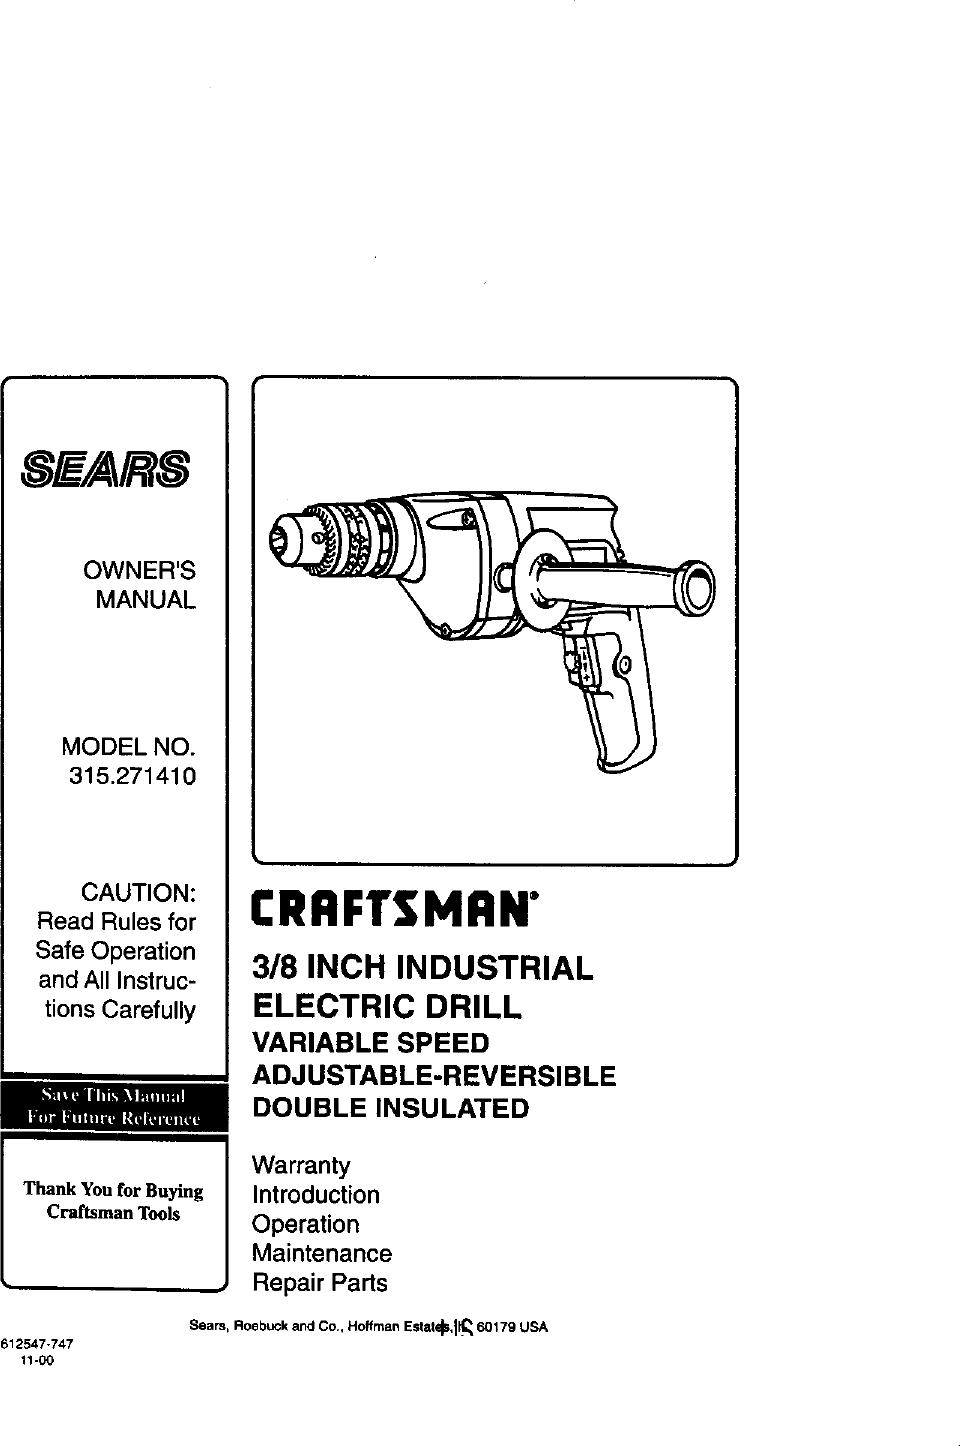 Craftsman 315271410 User Manual 3/8 ELECTRIC DRILL Manuals